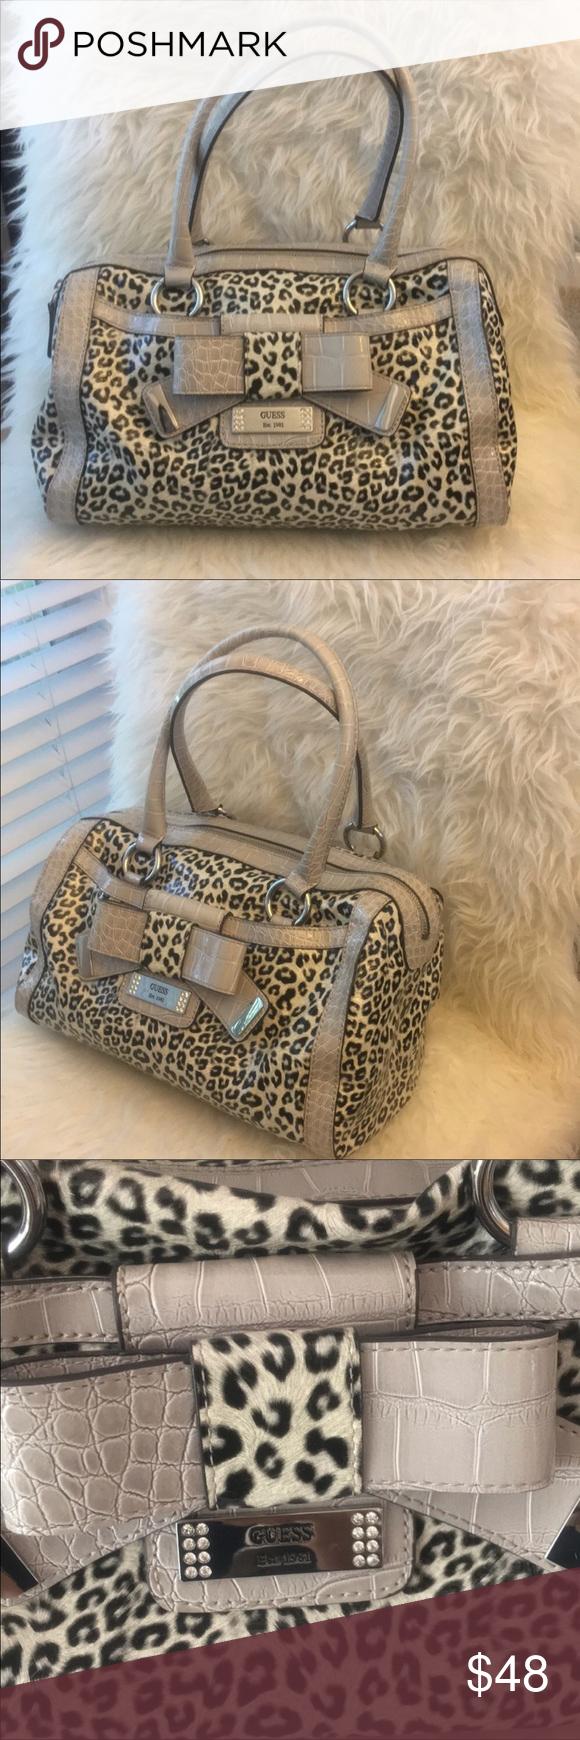 Guess Handbag Gorgeous animal print handbag with a beautiful bow detail b2cd689110e1b